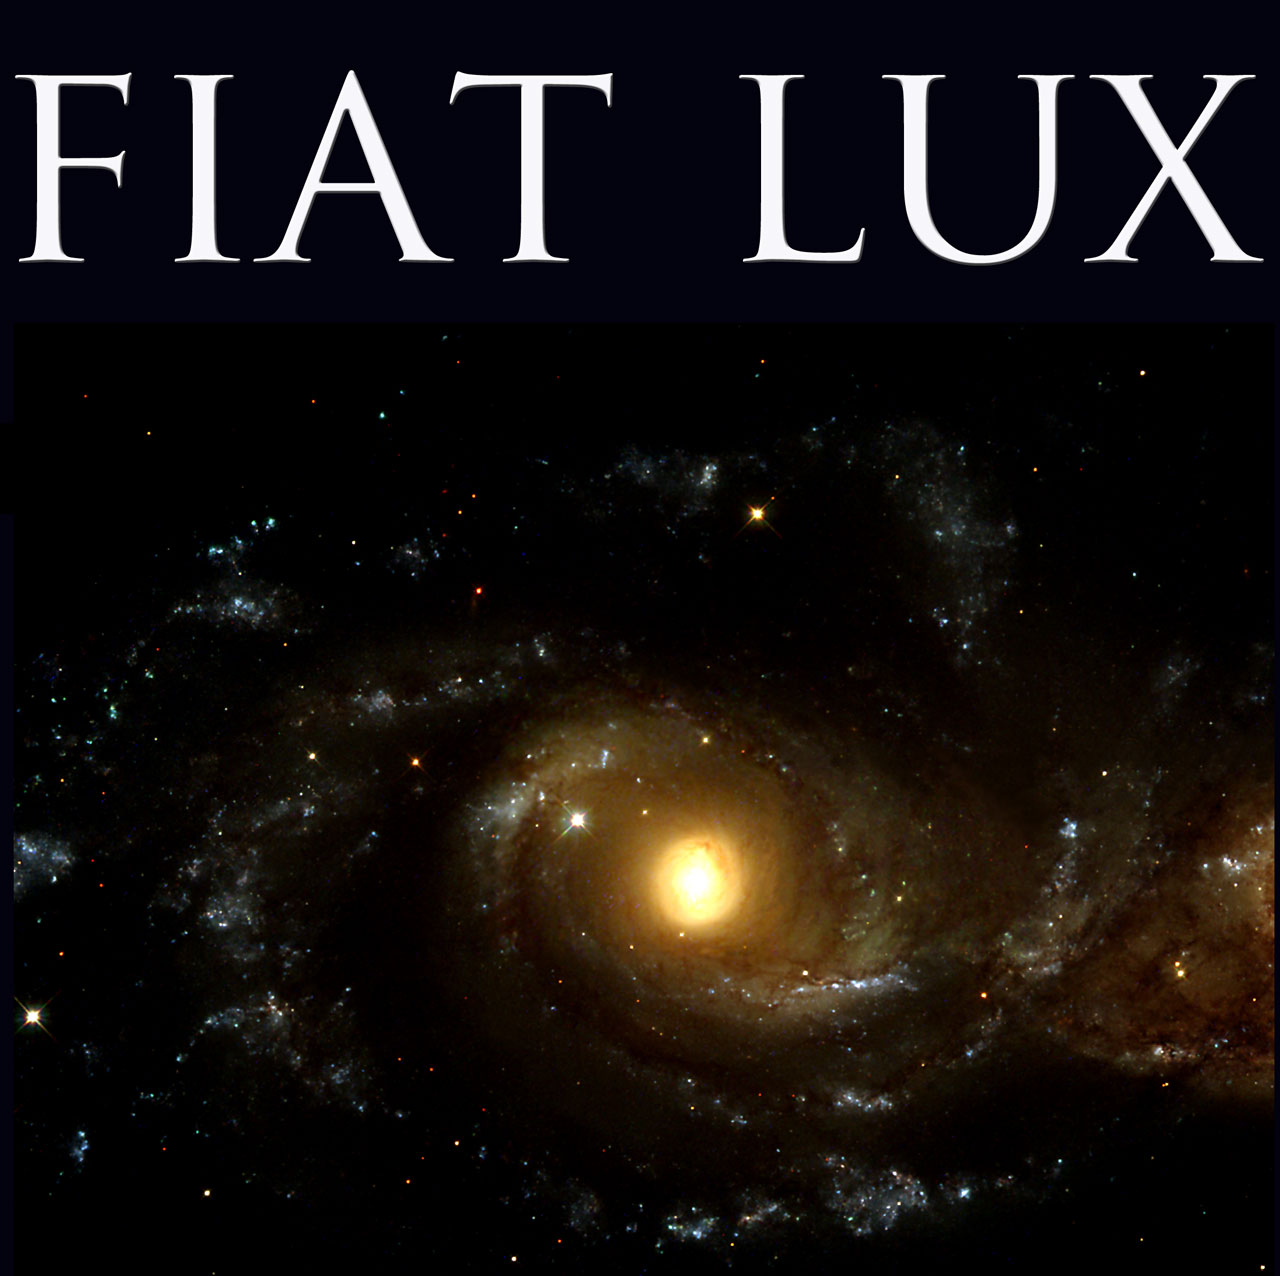 Poppular Photography Fiat Lux